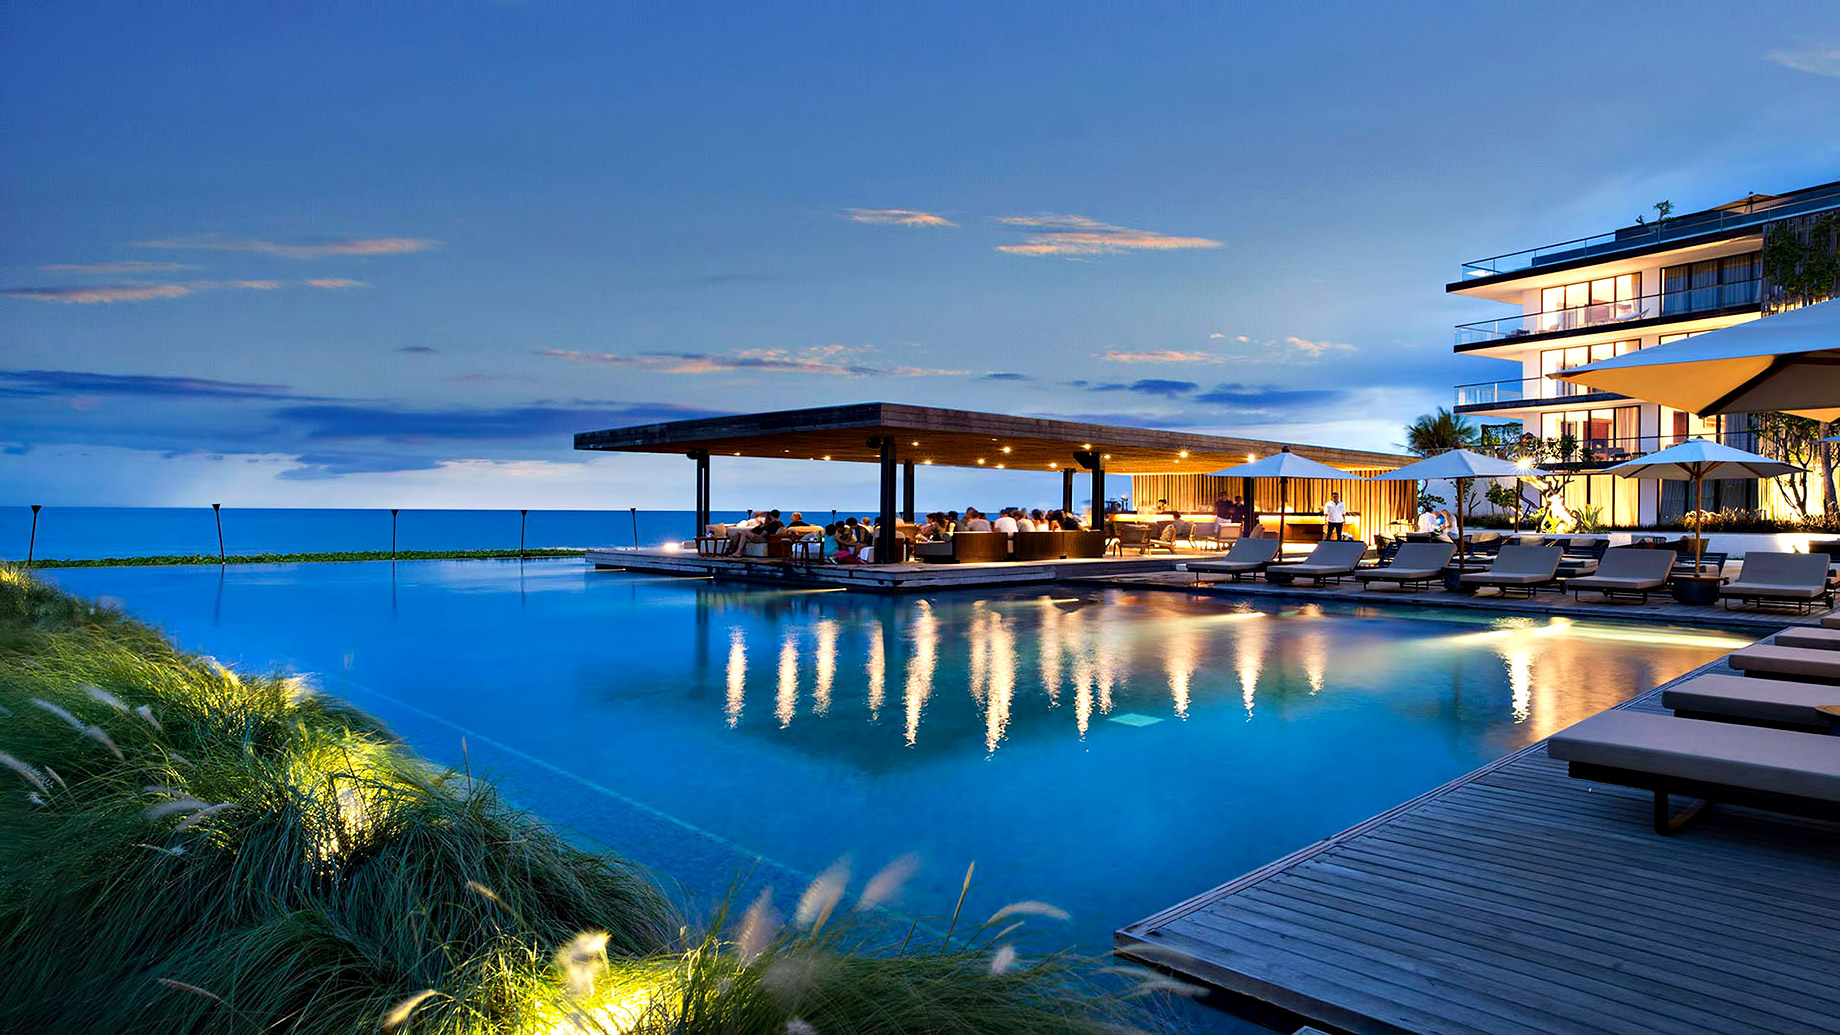 Cheers to your wonderful trip at a Seminyak beach club - Bali, Indonesia